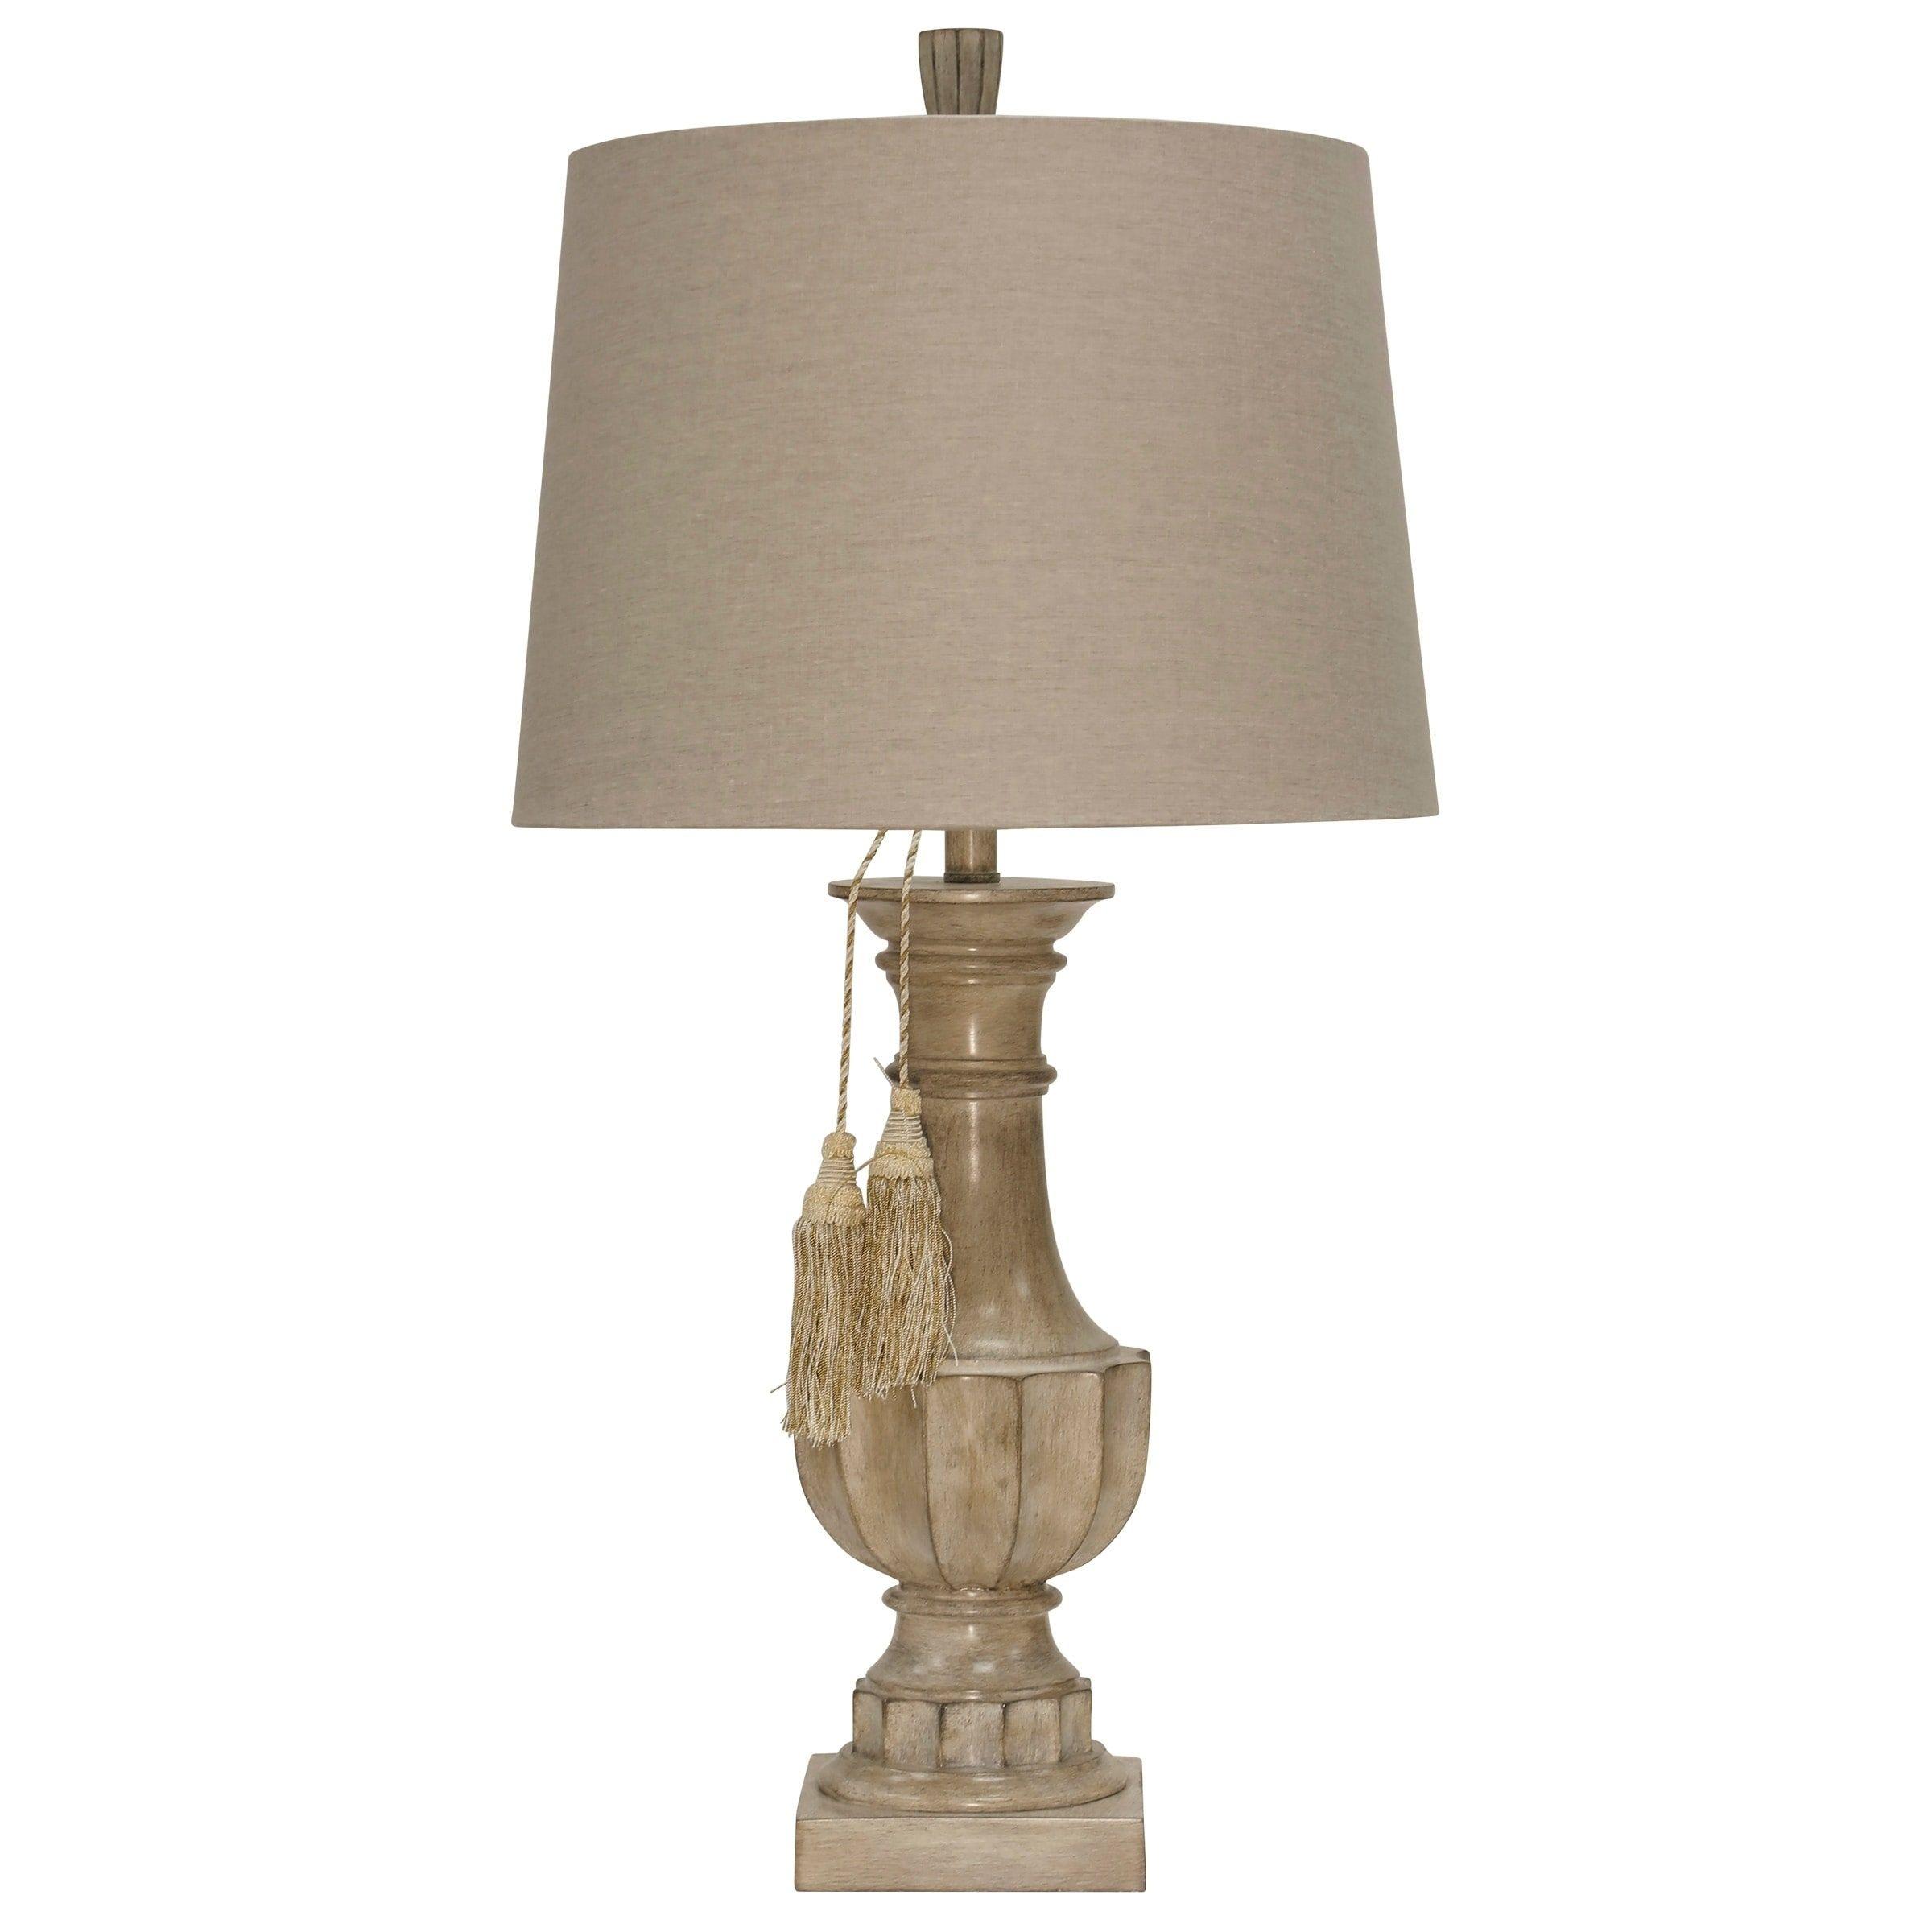 Bokava Beige Table Lamp Beige Shade In 2019 Beige Table Lamps